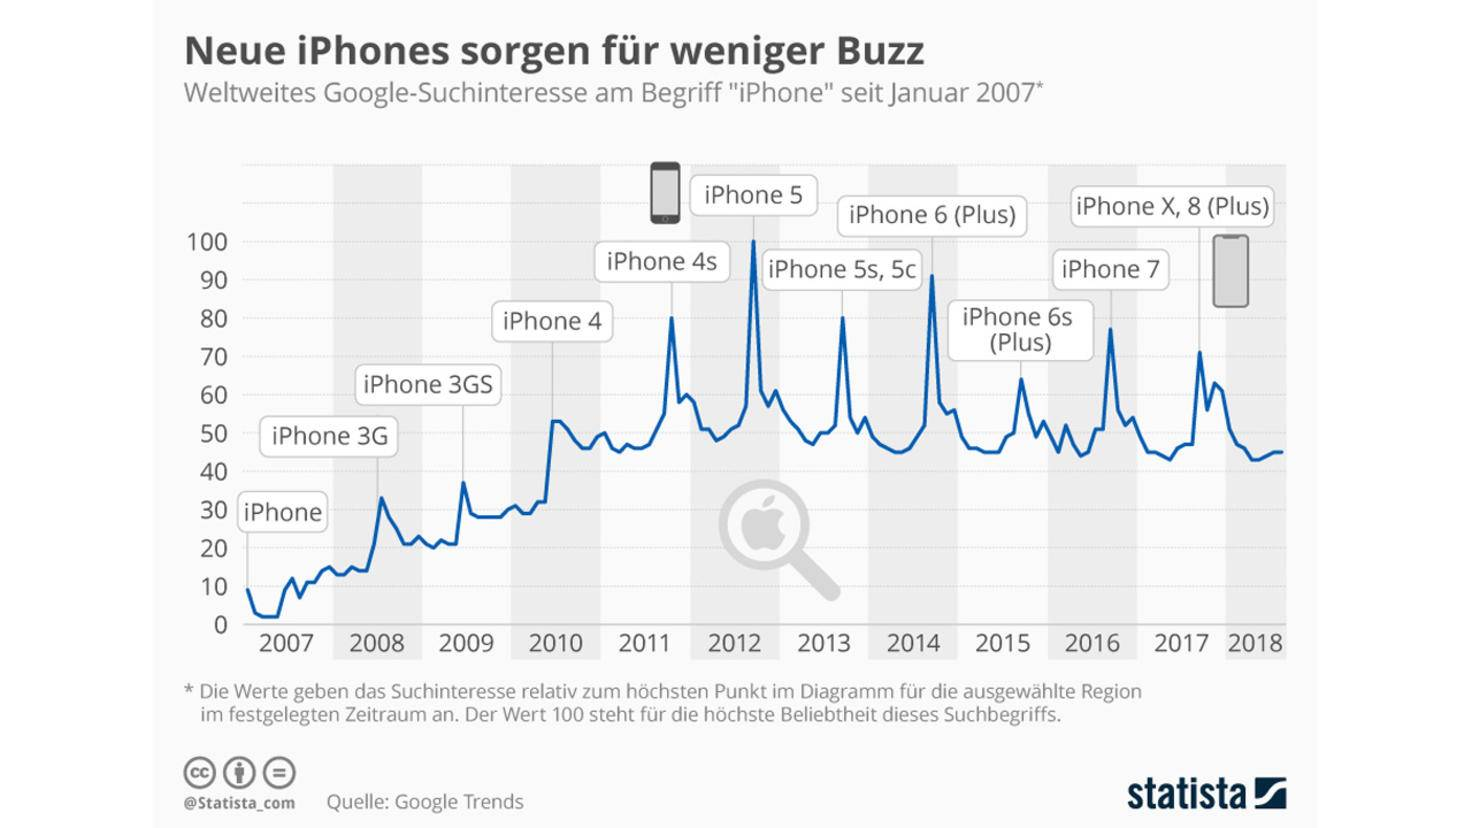 iPhone Buzz